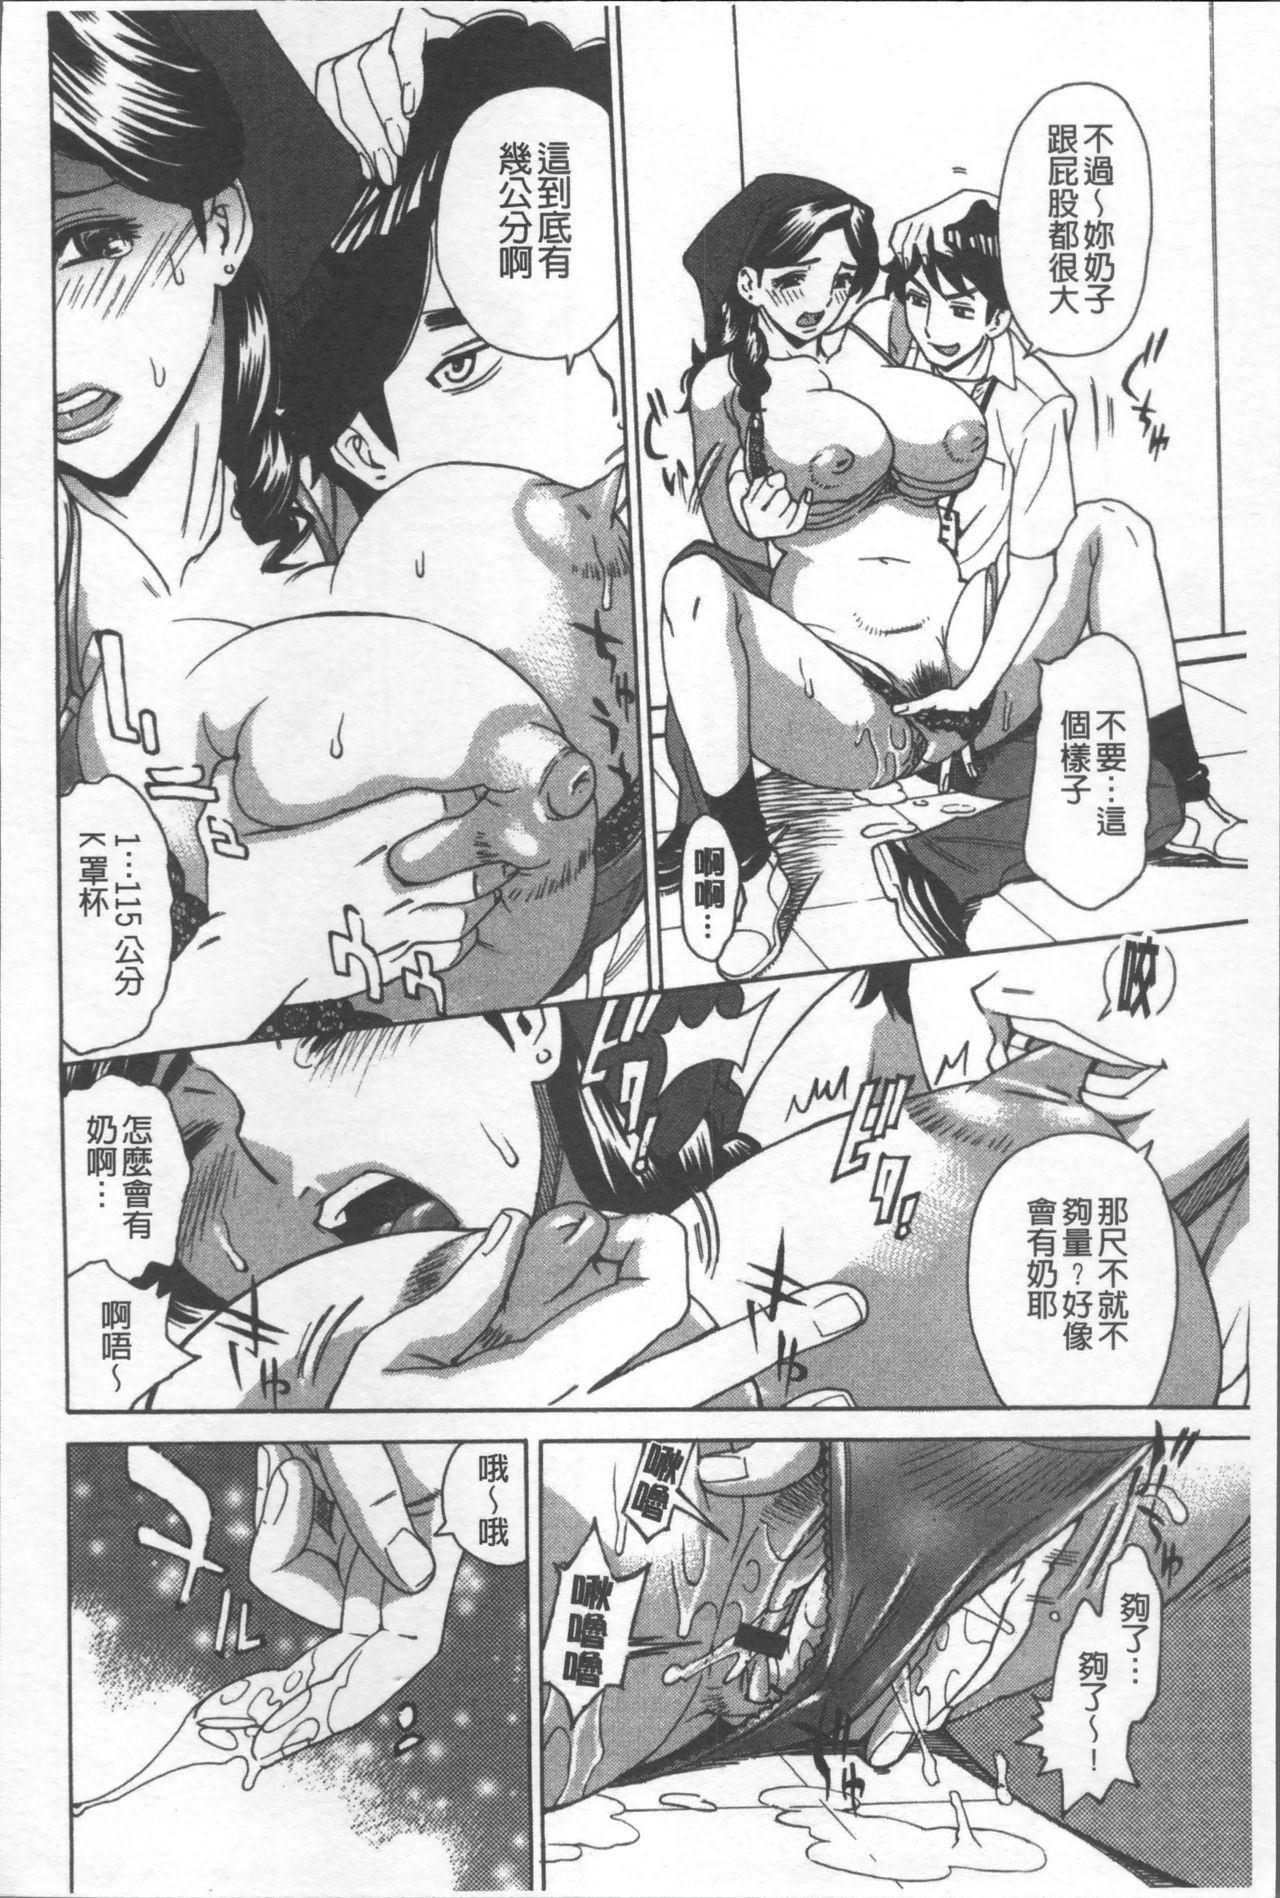 Hitozuma Kanshasai - SUPER EROTIC WIFE'S FESTIVAL 71